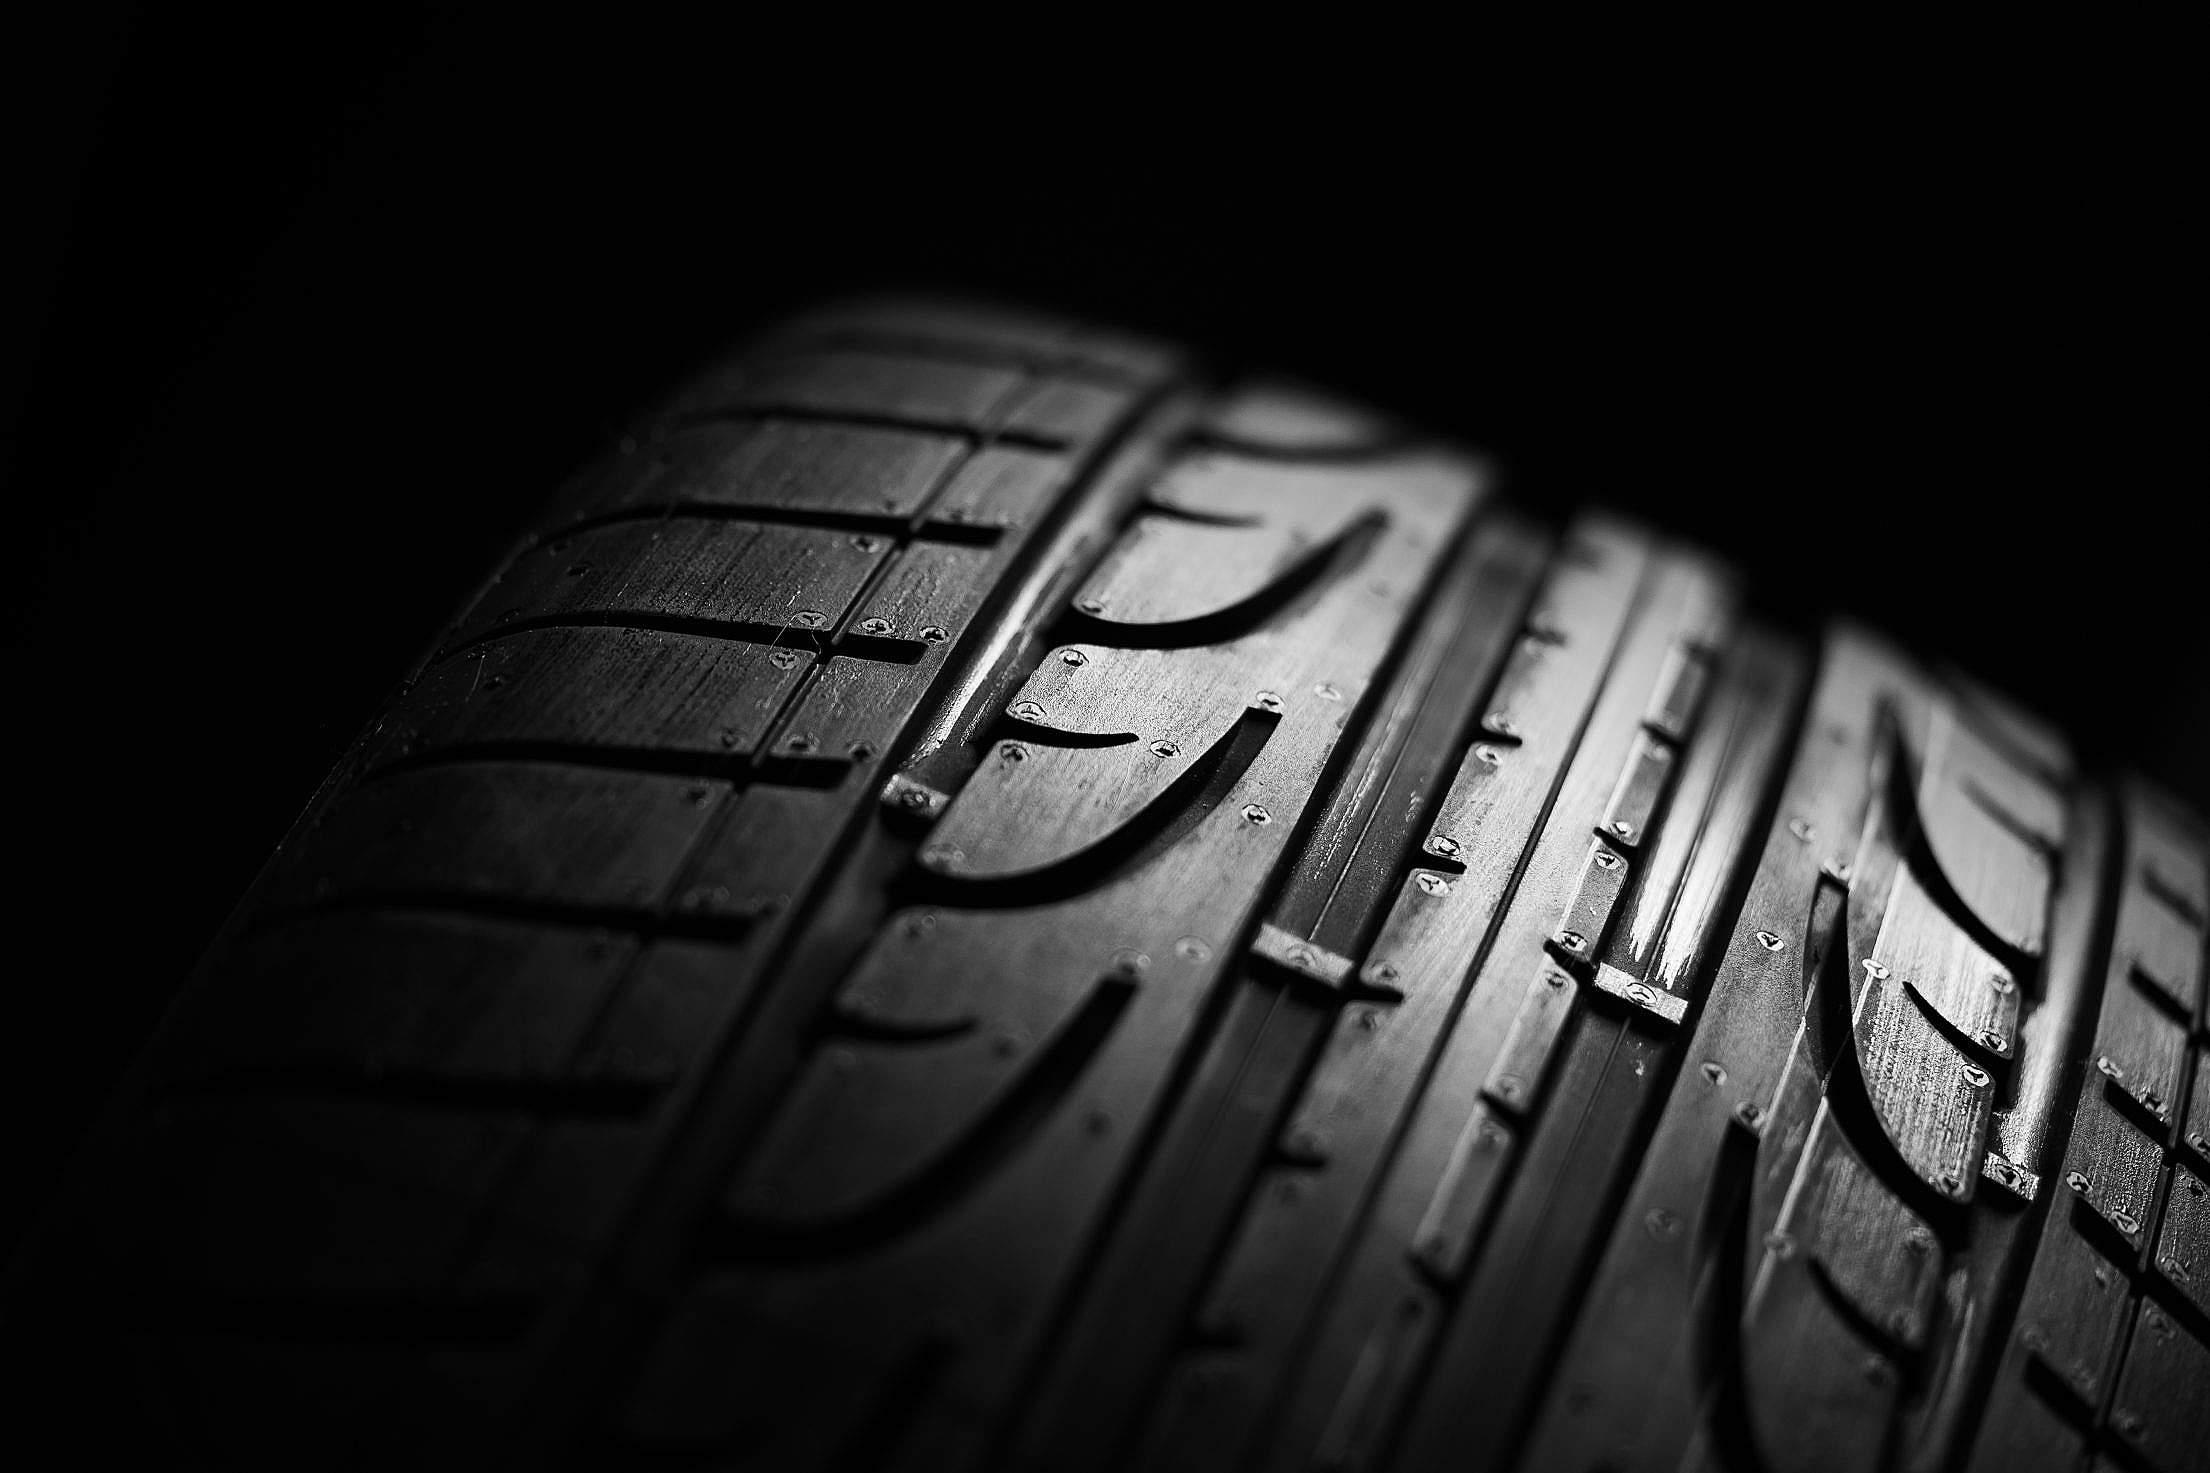 Studio Shot of a Car Tire Free Stock Photo